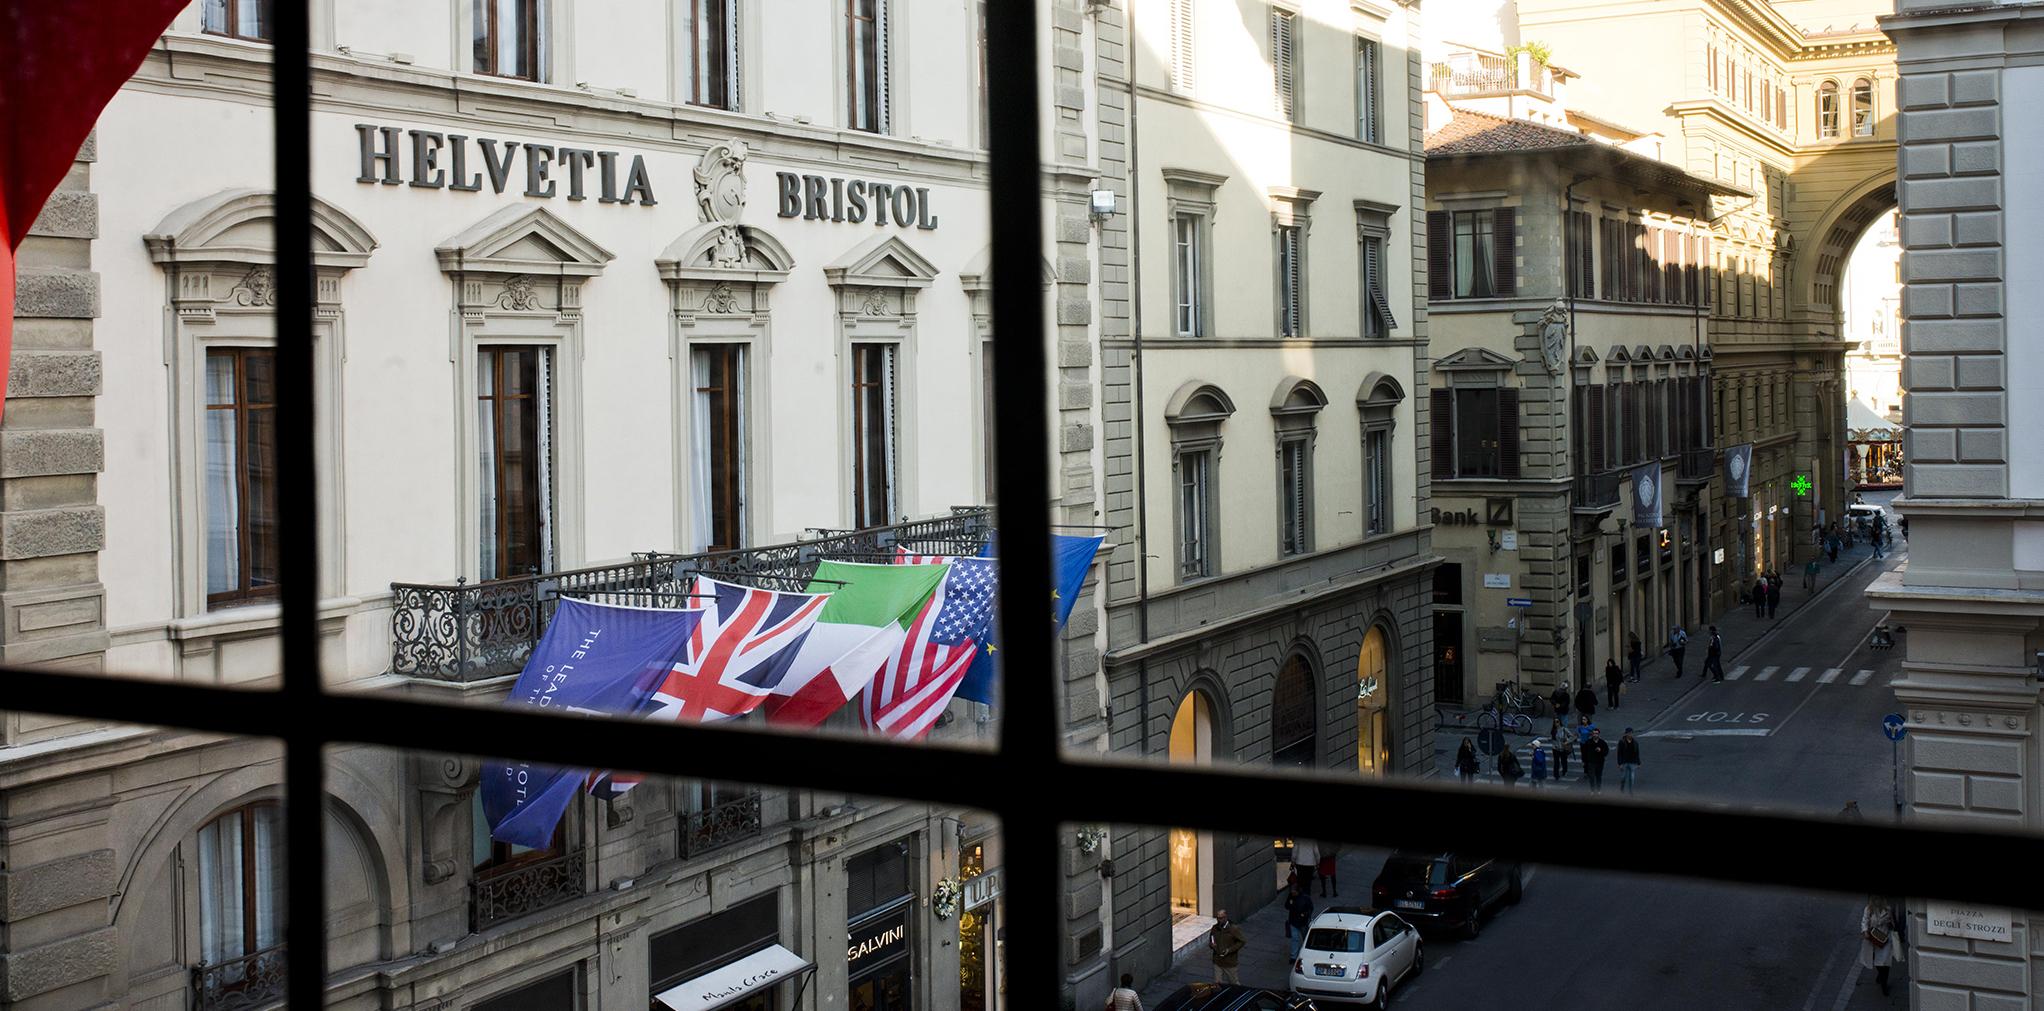 Hotel Helvetia & Bristol ***** , Florence / Italy